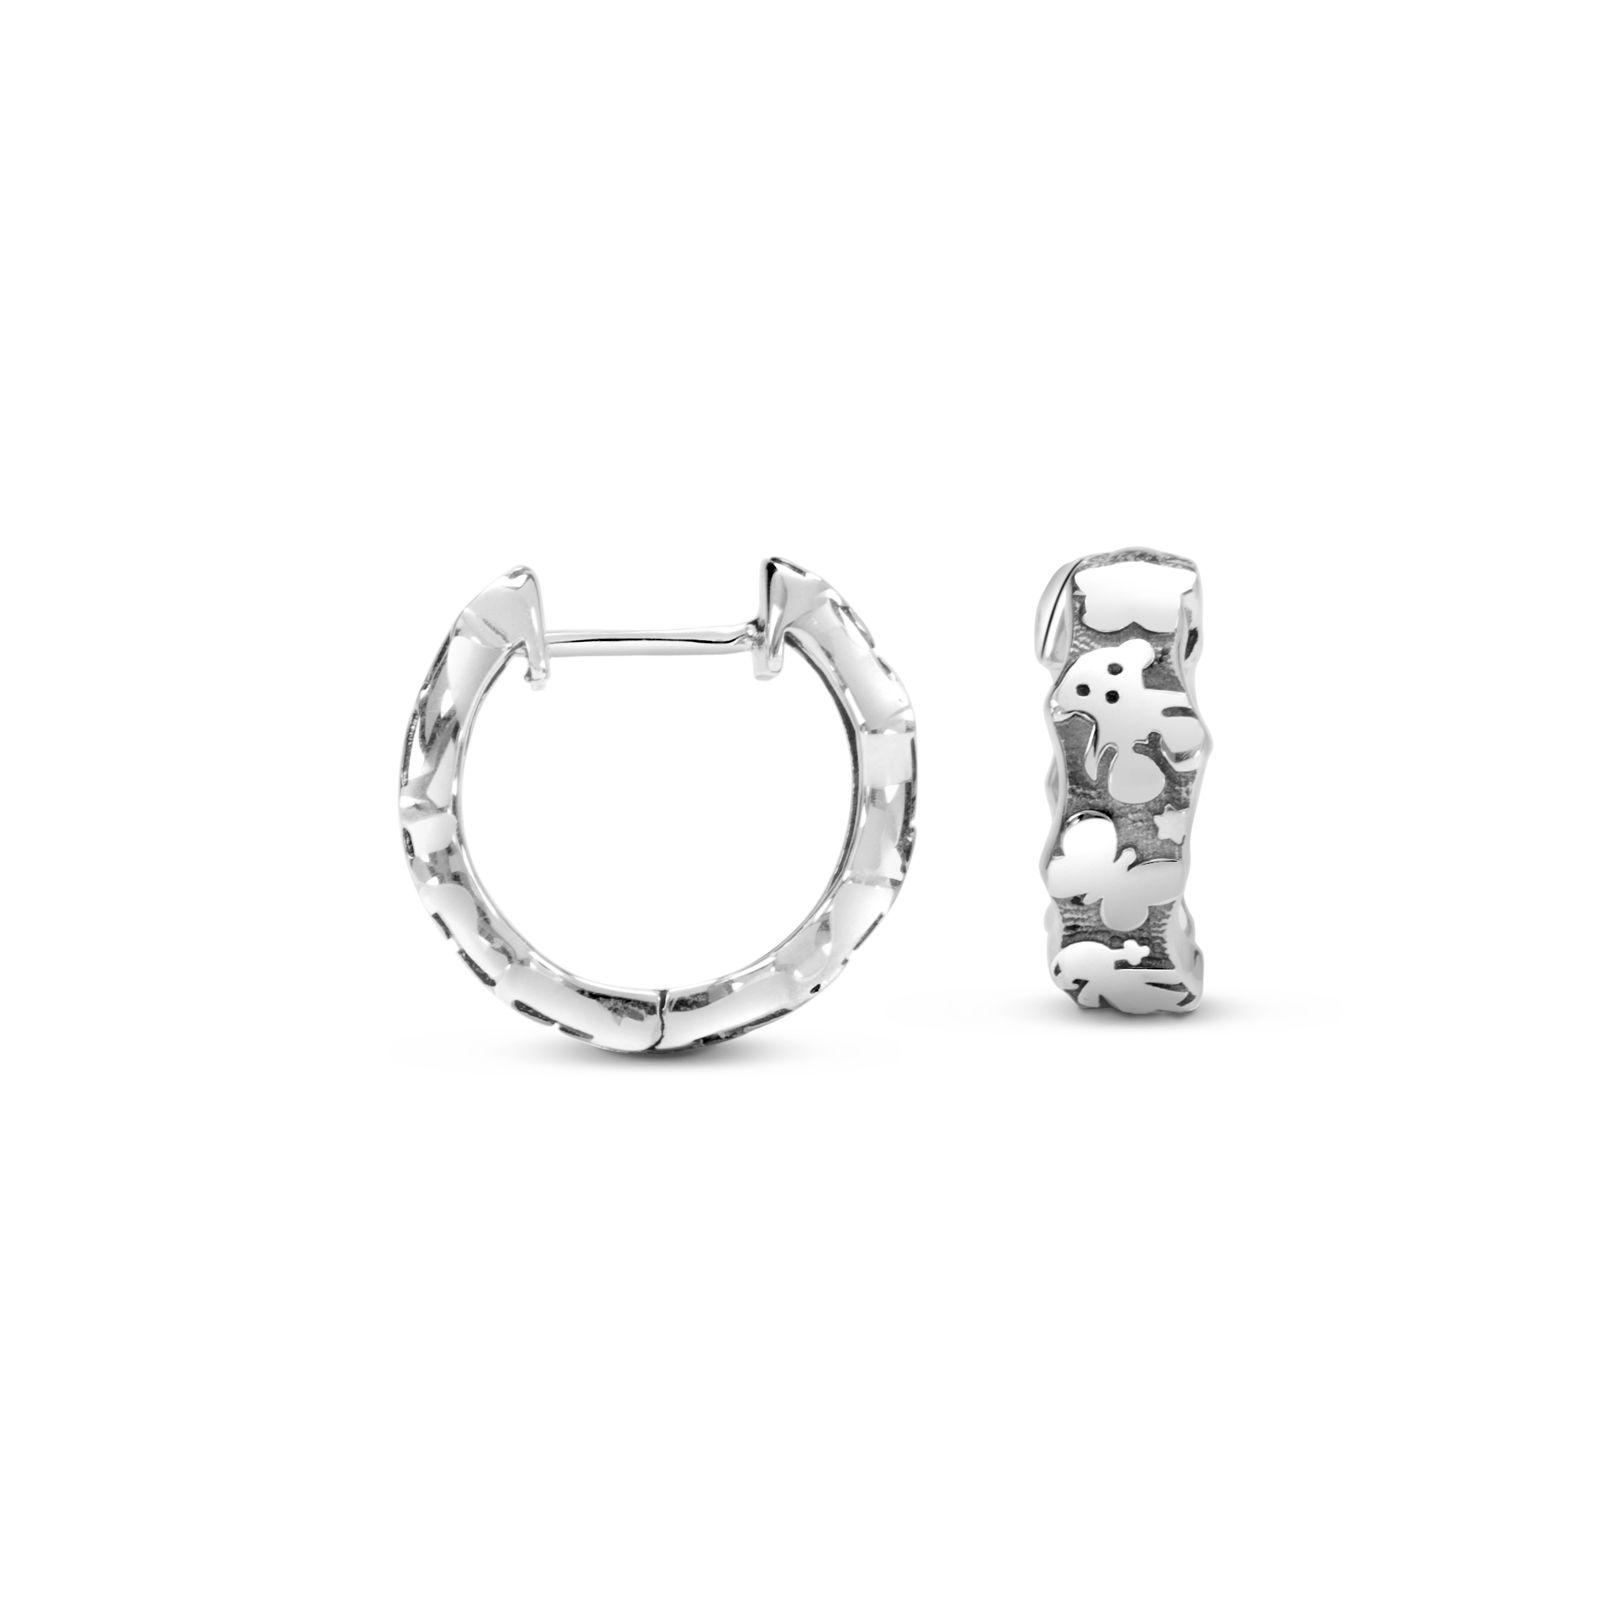 Animalandia - Woman - Earrings   TOUS US Shop Online